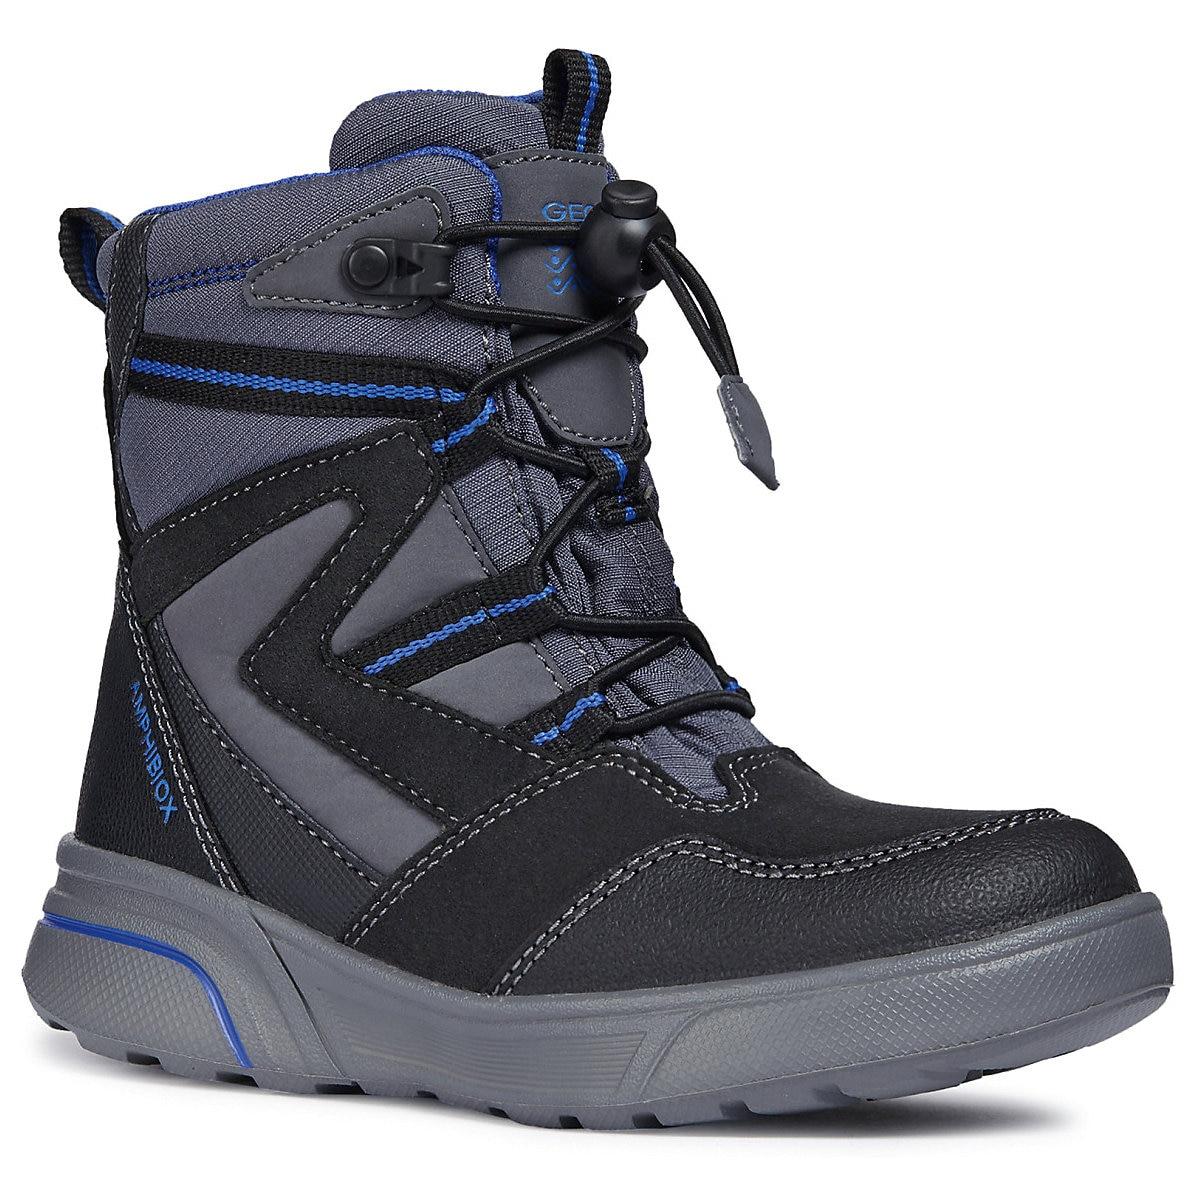 GEOX Boots 8786521 children shoes For boy Winter Boys faux fur MTpromo